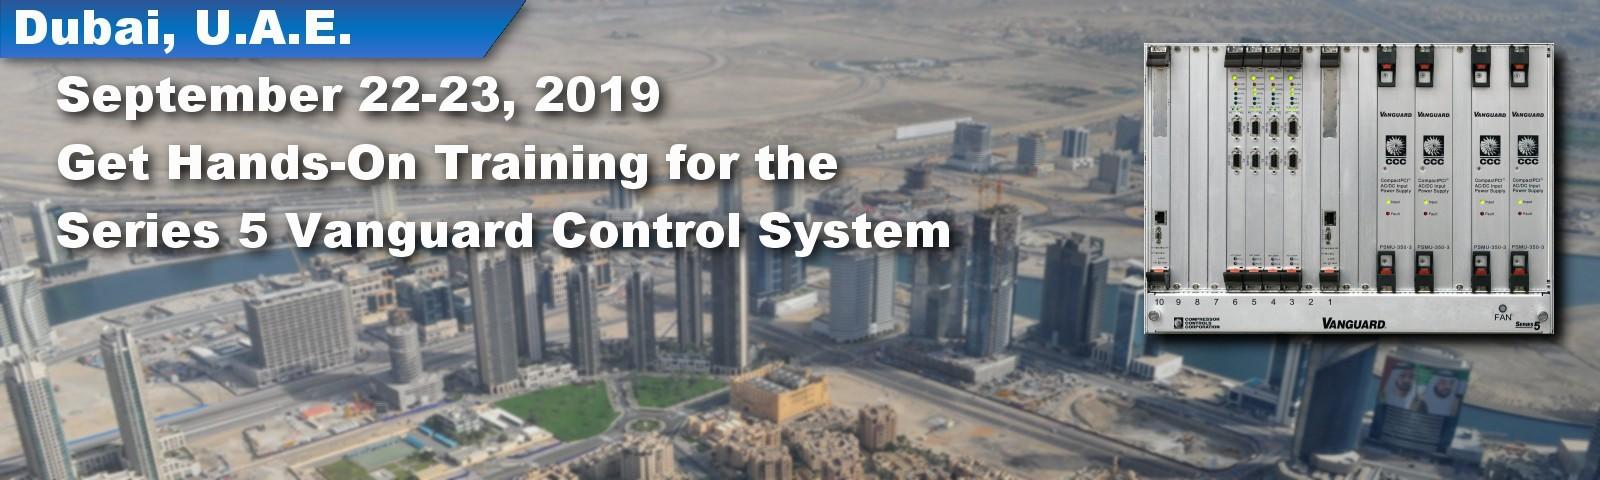 2019 Dubai S5 Vanguard Regional Training | <a  data-cke-saved-href='https://learning.cccglobal.com/ProductDetails.aspx?ProductID=284' href='https://learning.cccglobal.com/ProductDetails.aspx?ProductID=284'>Register Now</a>